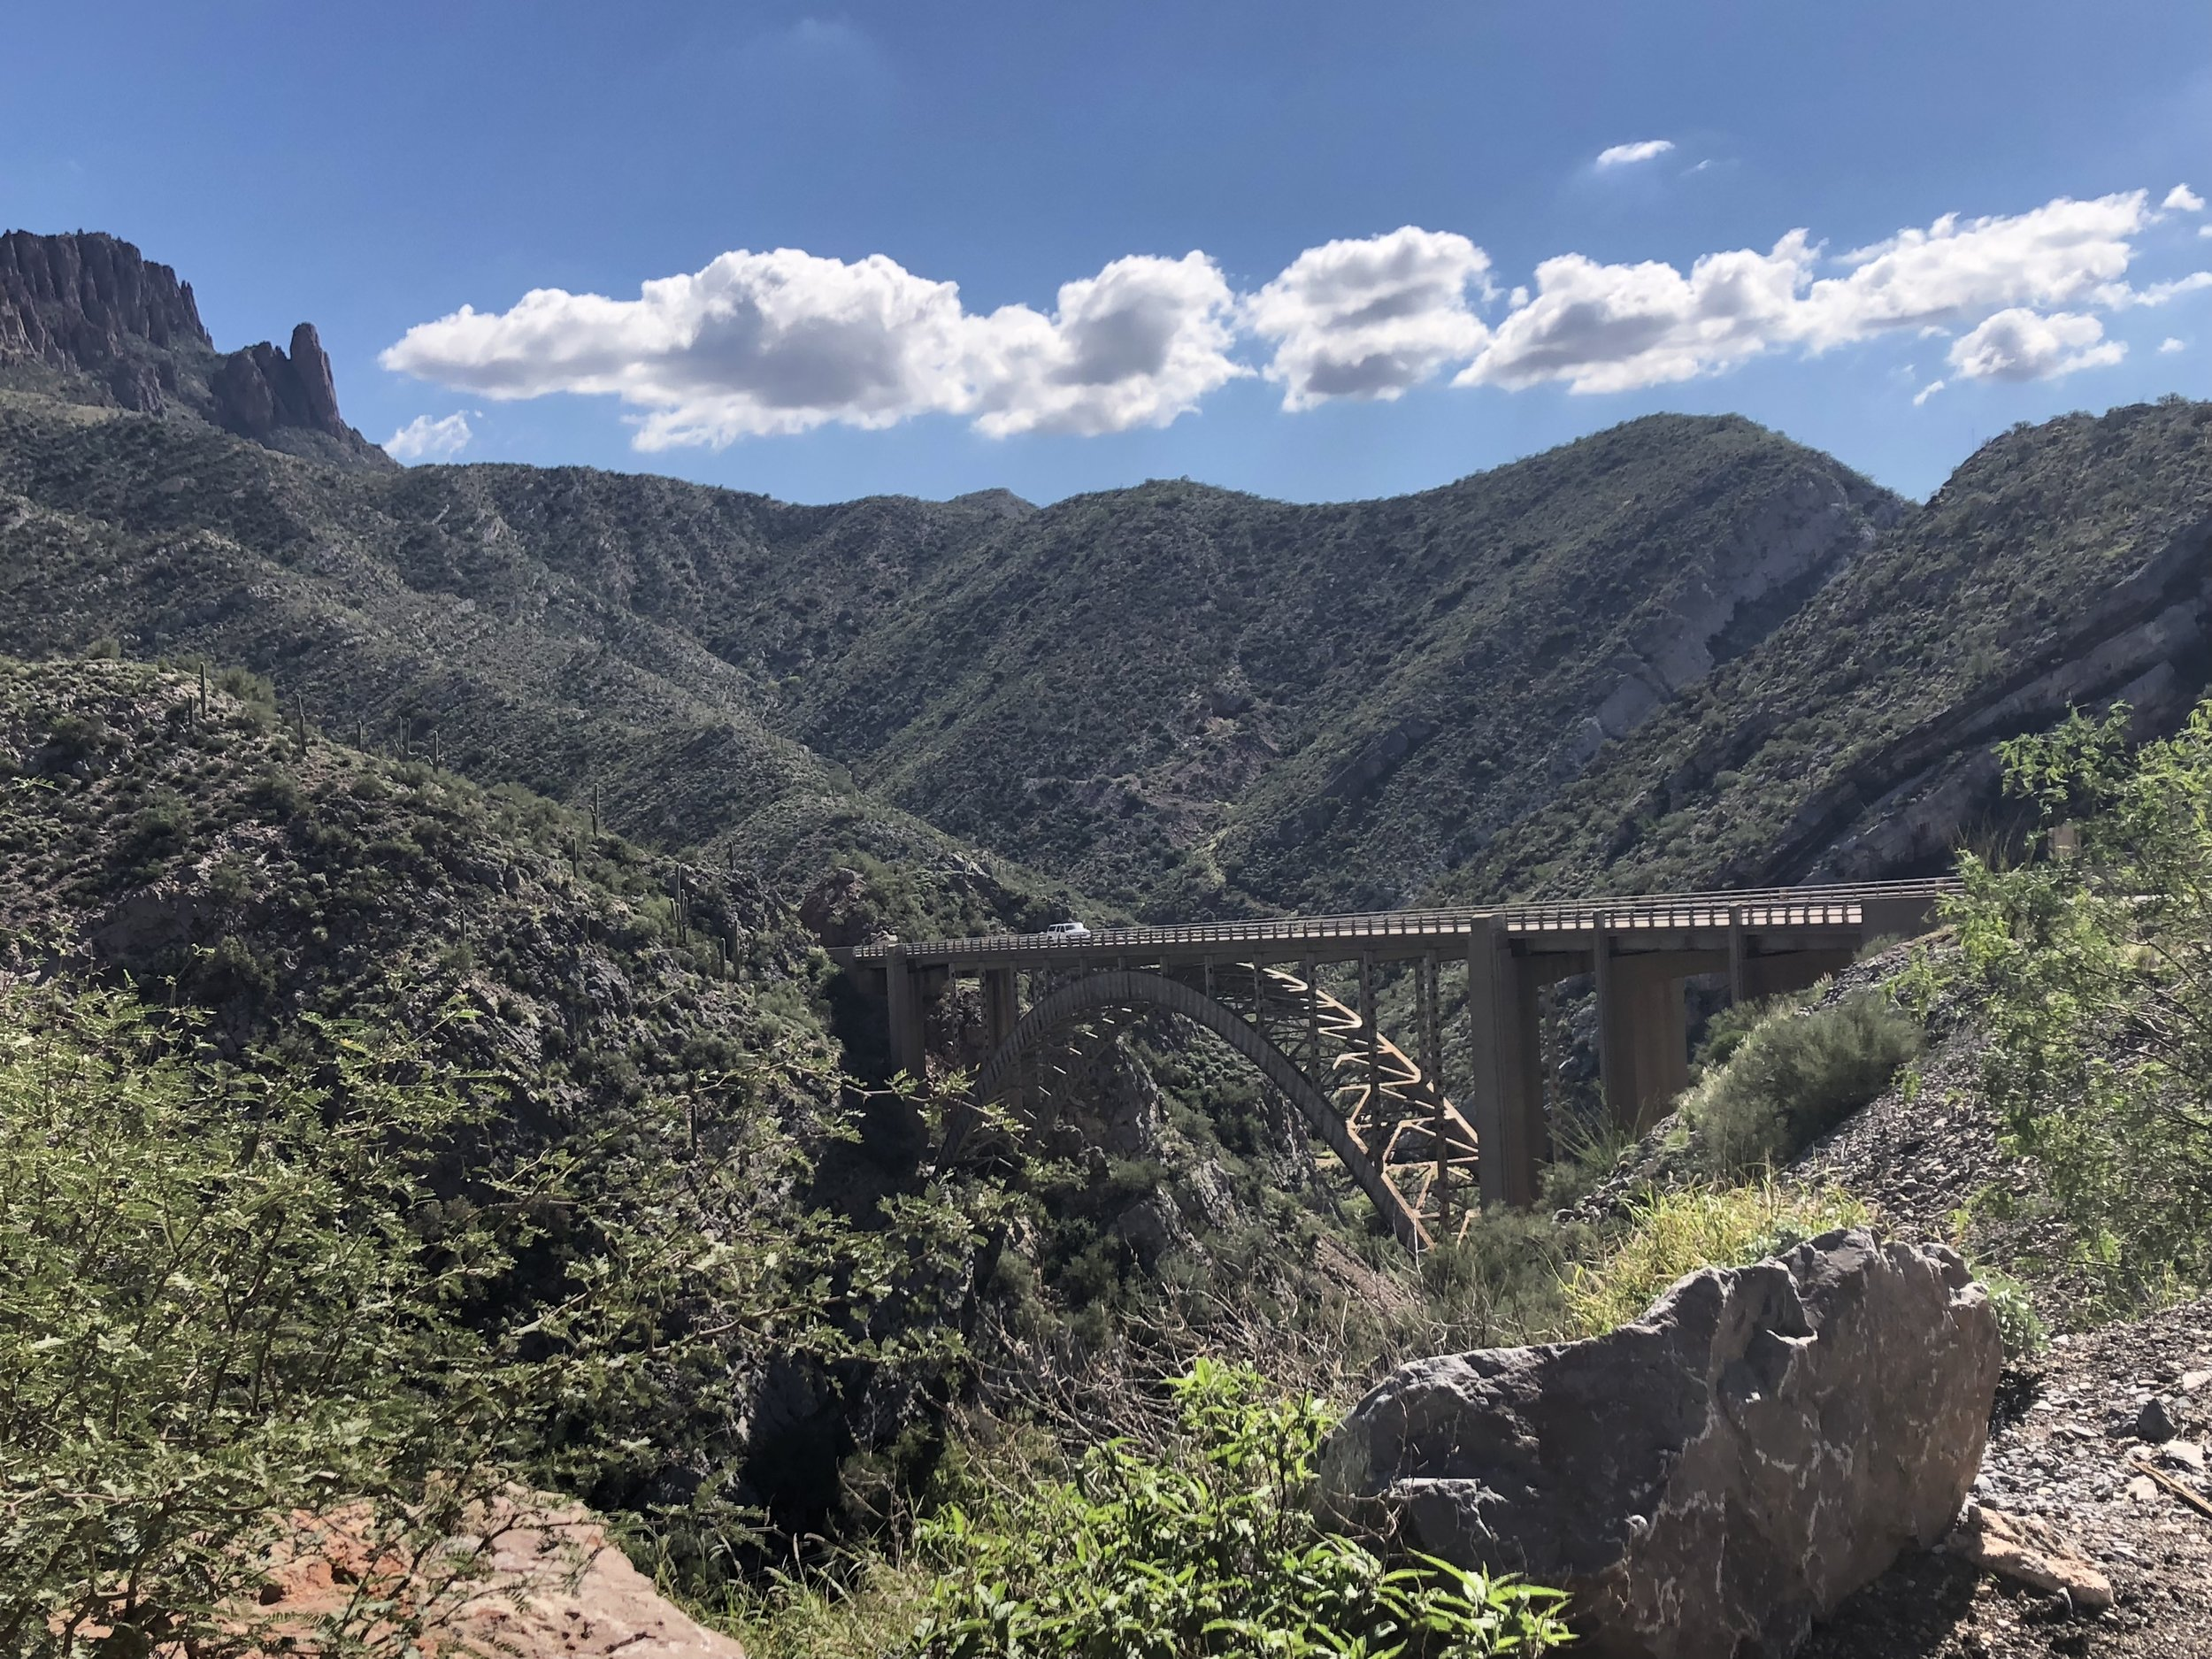 The bridge we road over.